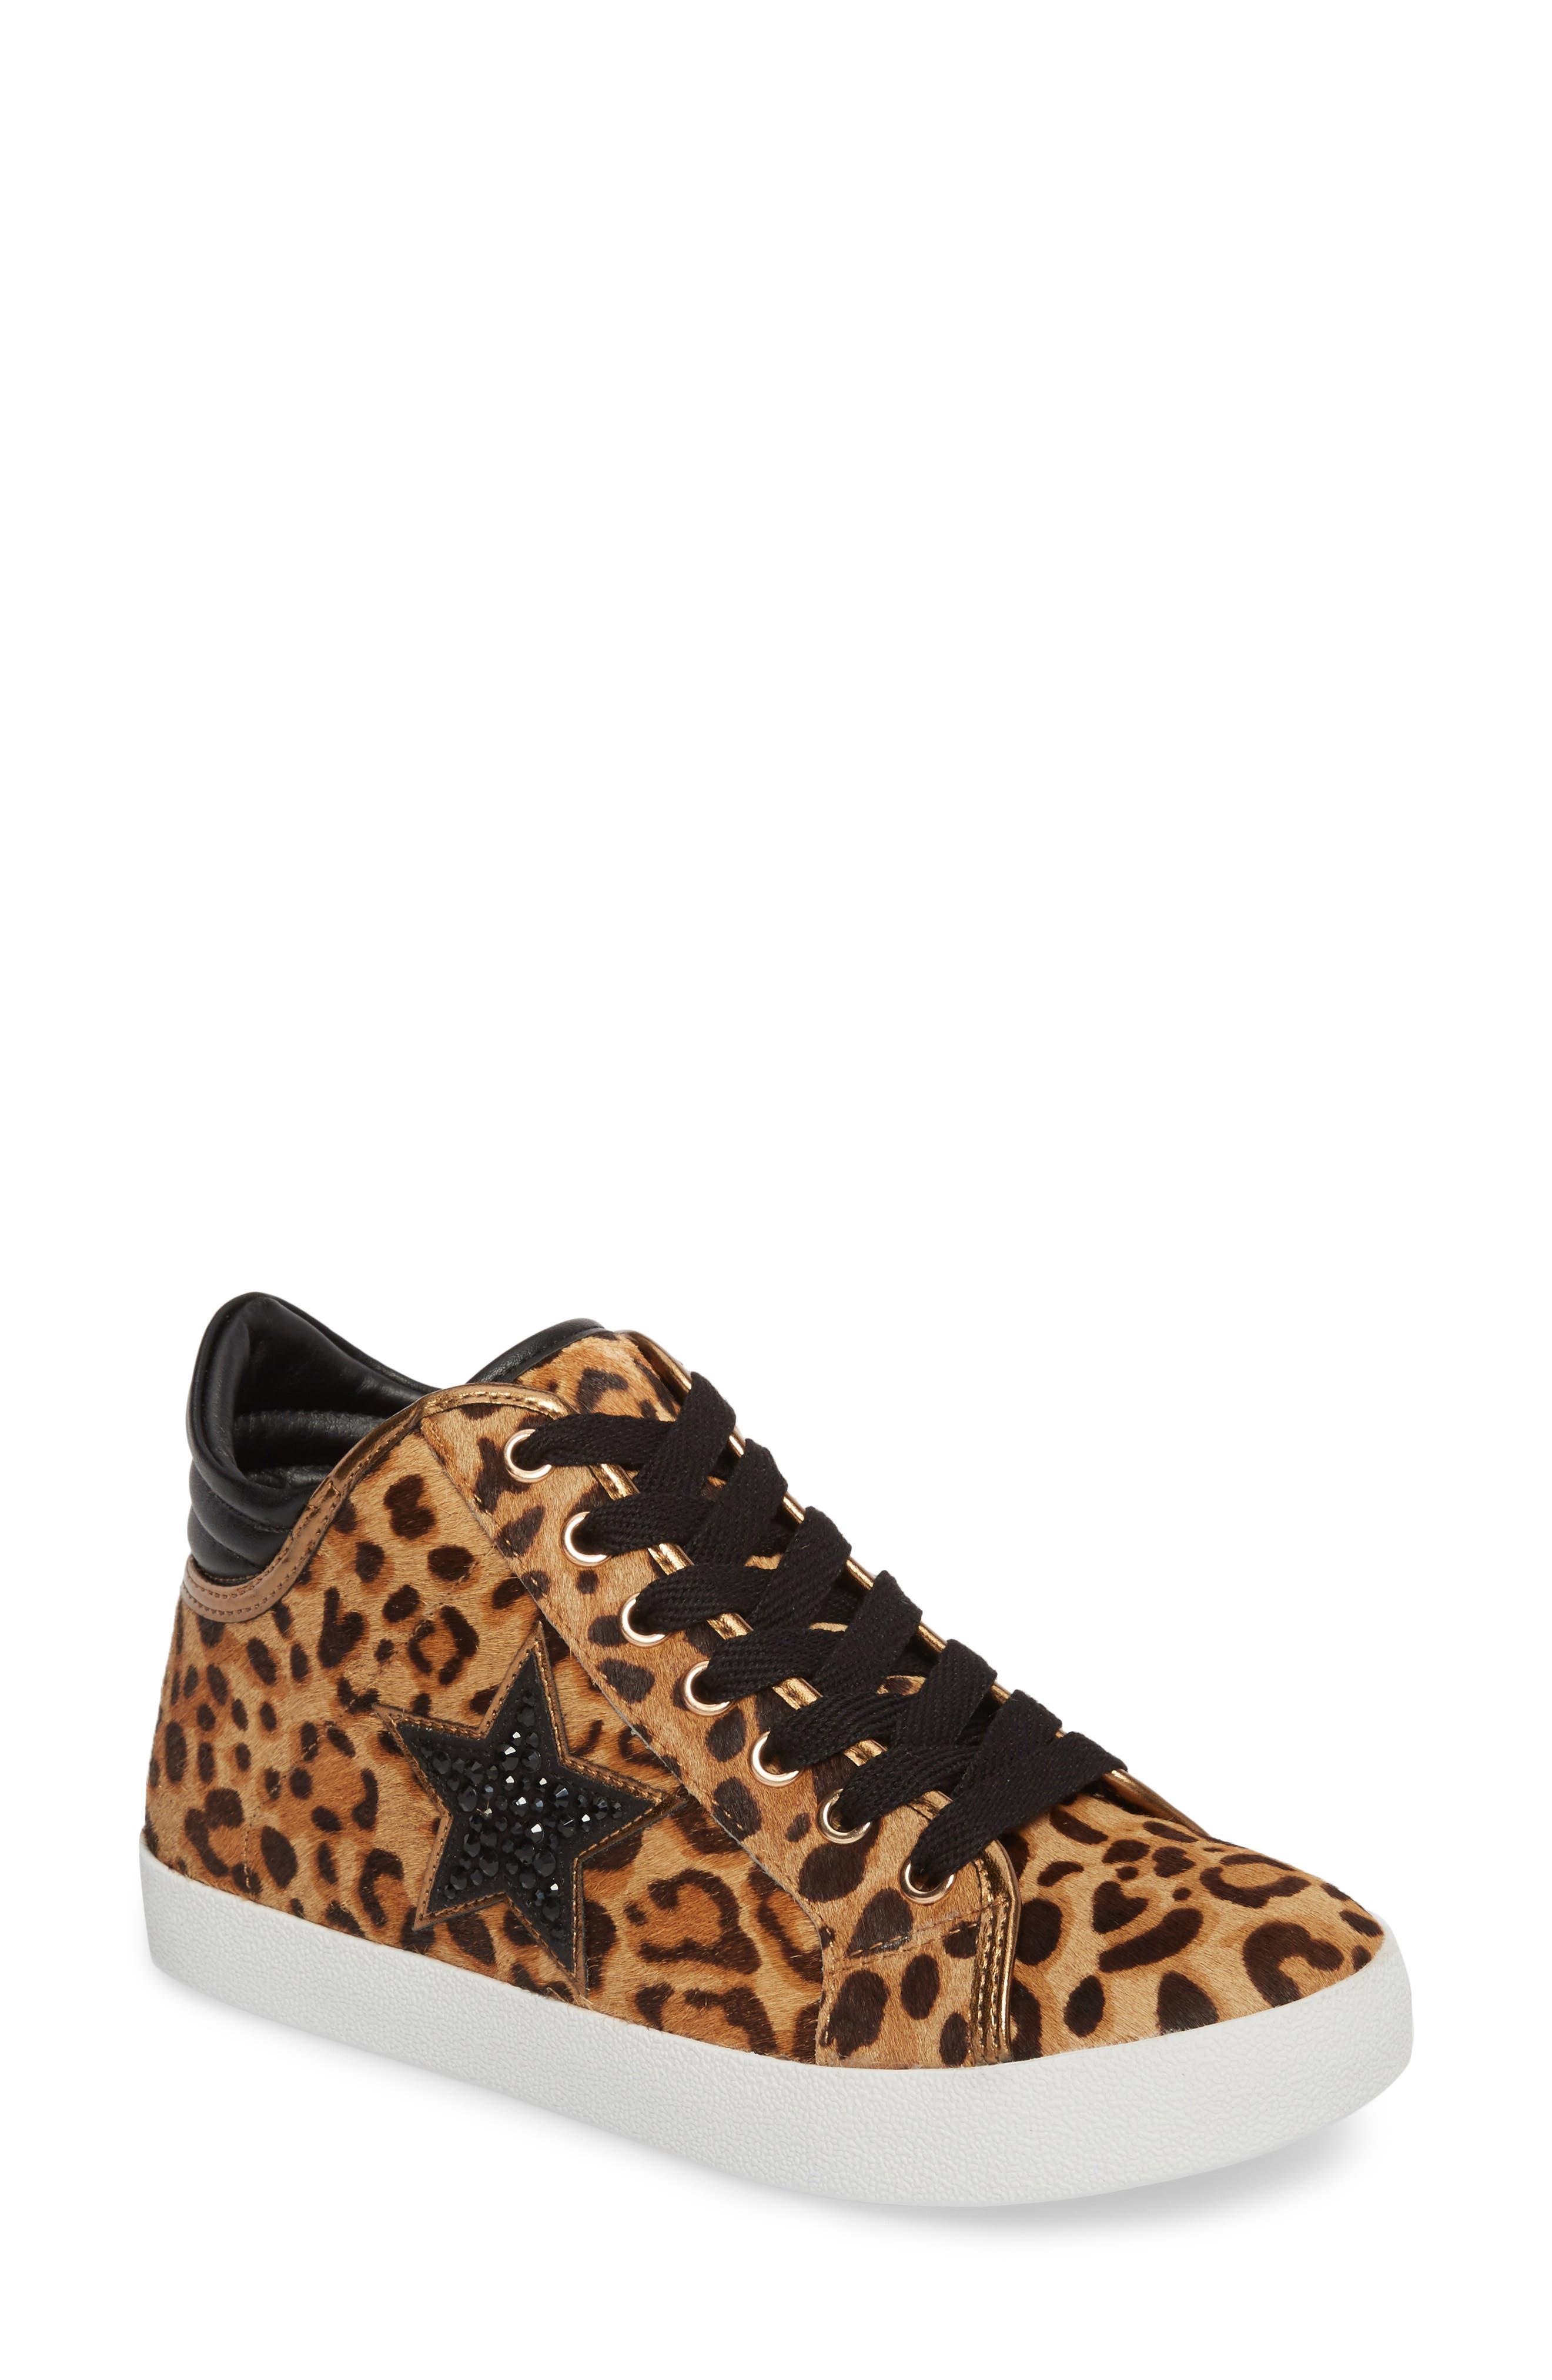 Savior Star Sneaker,                             Main thumbnail 1, color,                             Leopard Multi